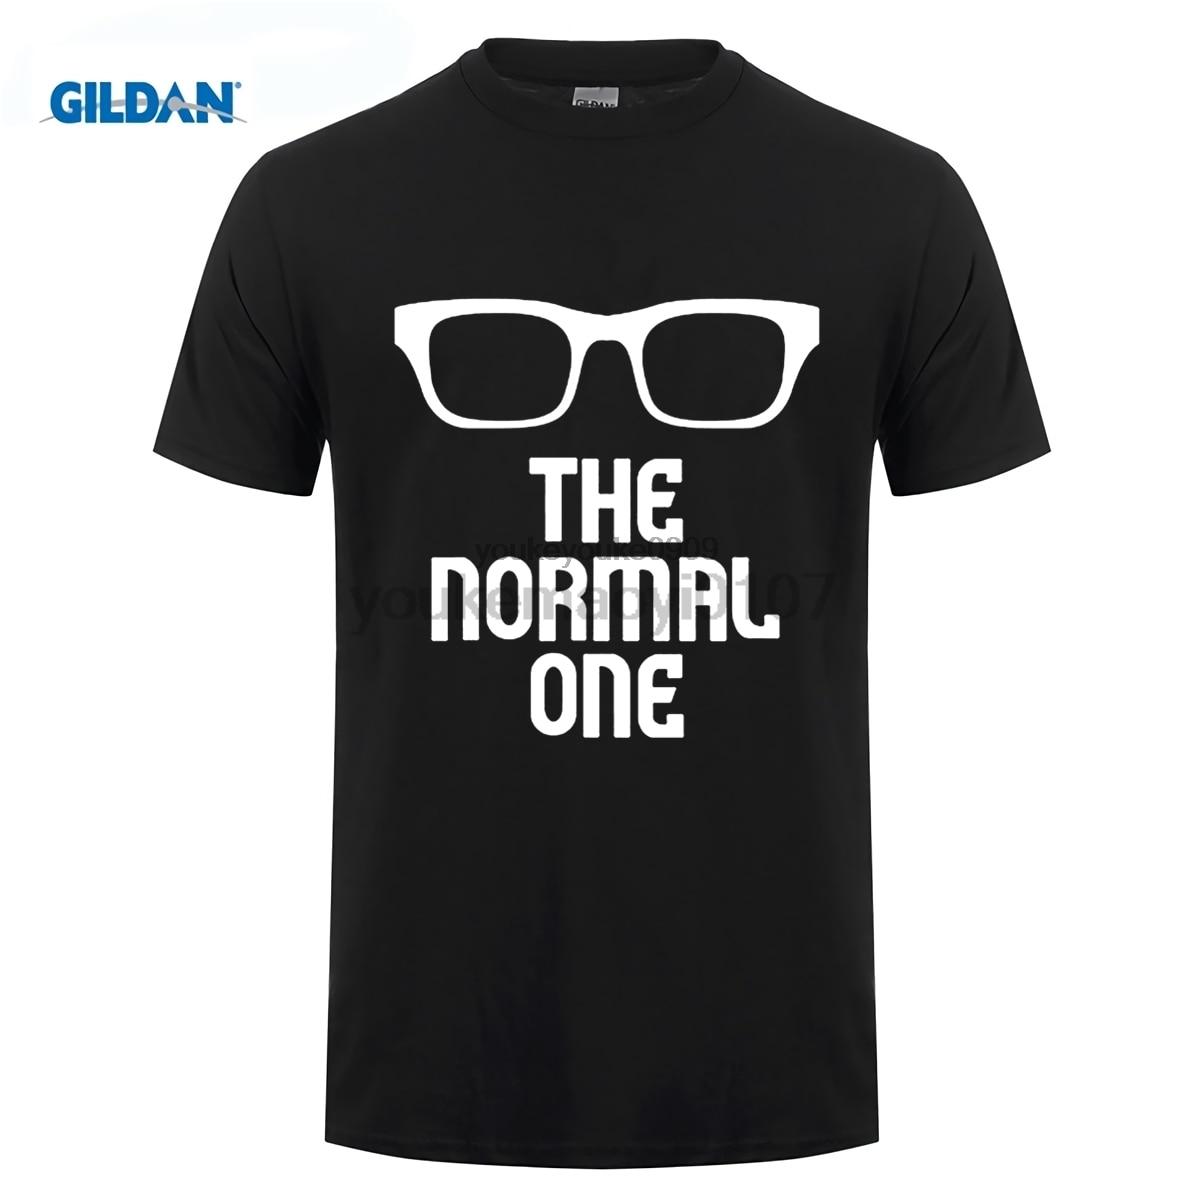 GILDAN fashion the normal one Jurgen Klopp red T-Shirt short sleeve T shirt free shipping